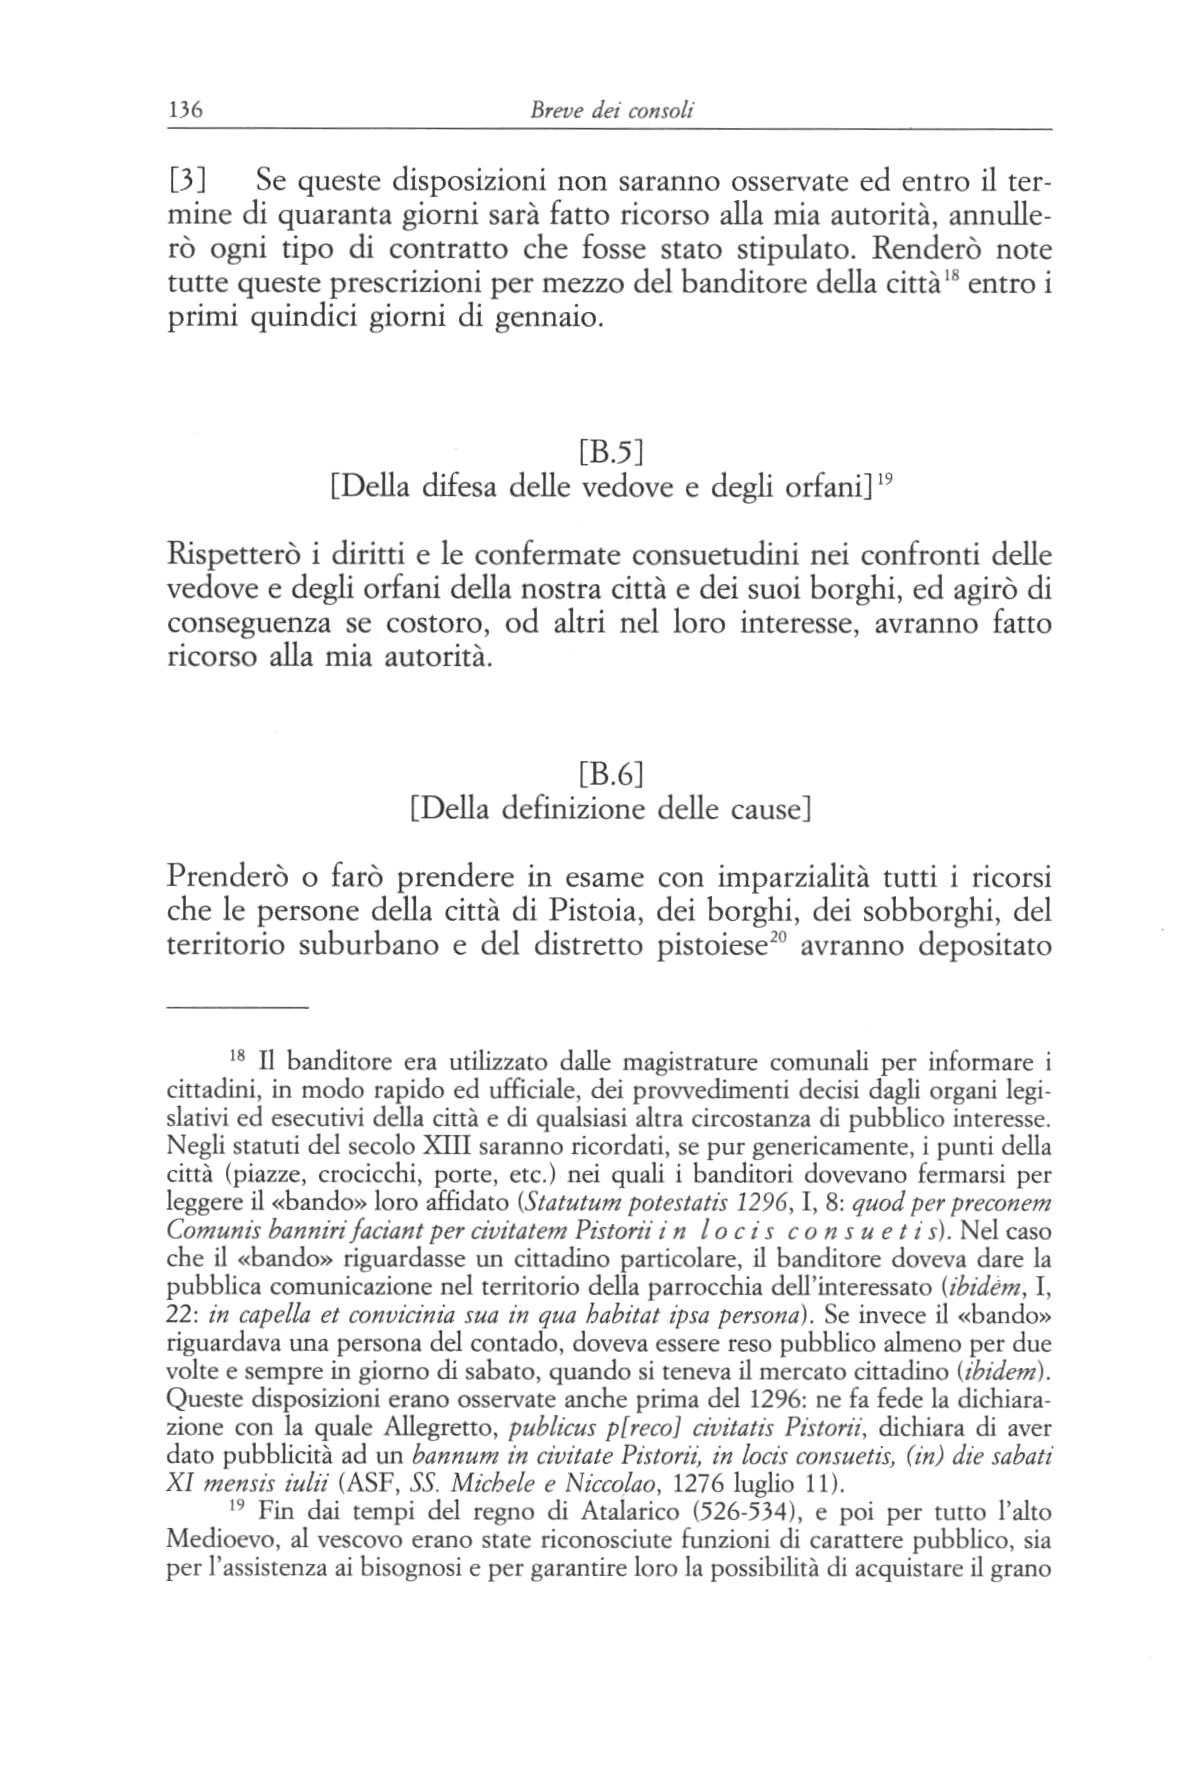 statuti pistoiesi del sec.XII 0136.jpg